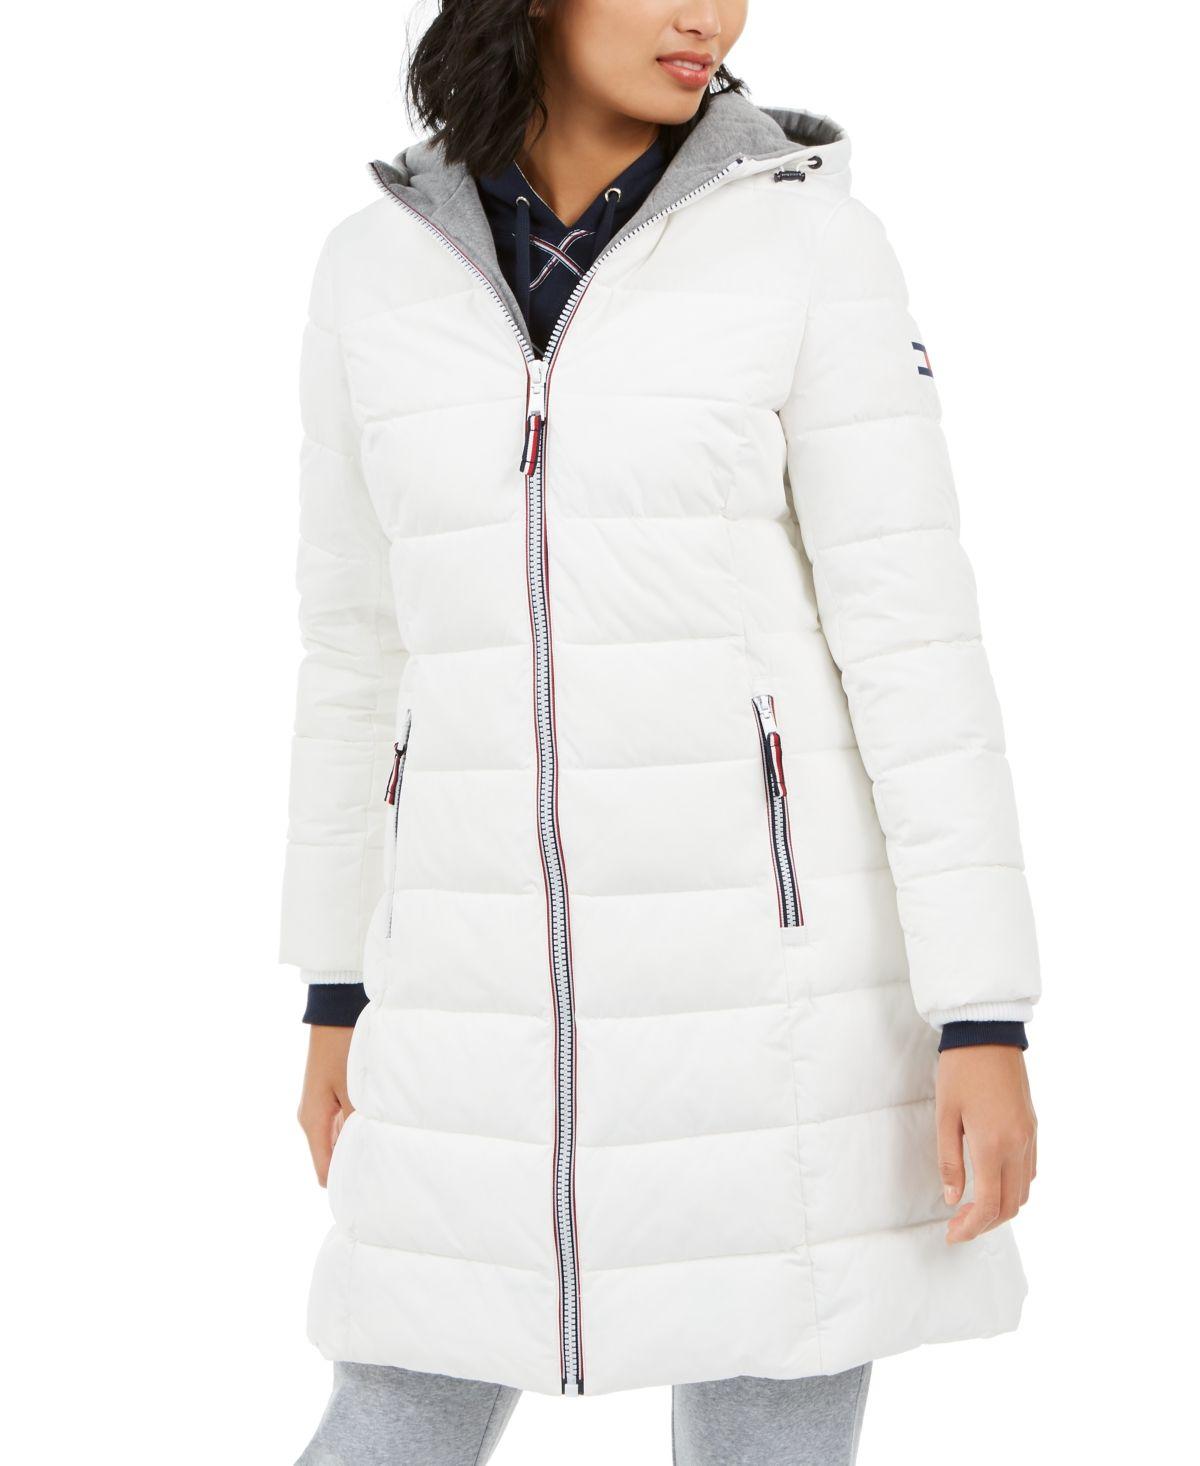 Tommy Hilfiger Hooded Puffer Coat White Puffer Coat Coats For Women Cheetah Print Coat [ 1466 x 1200 Pixel ]